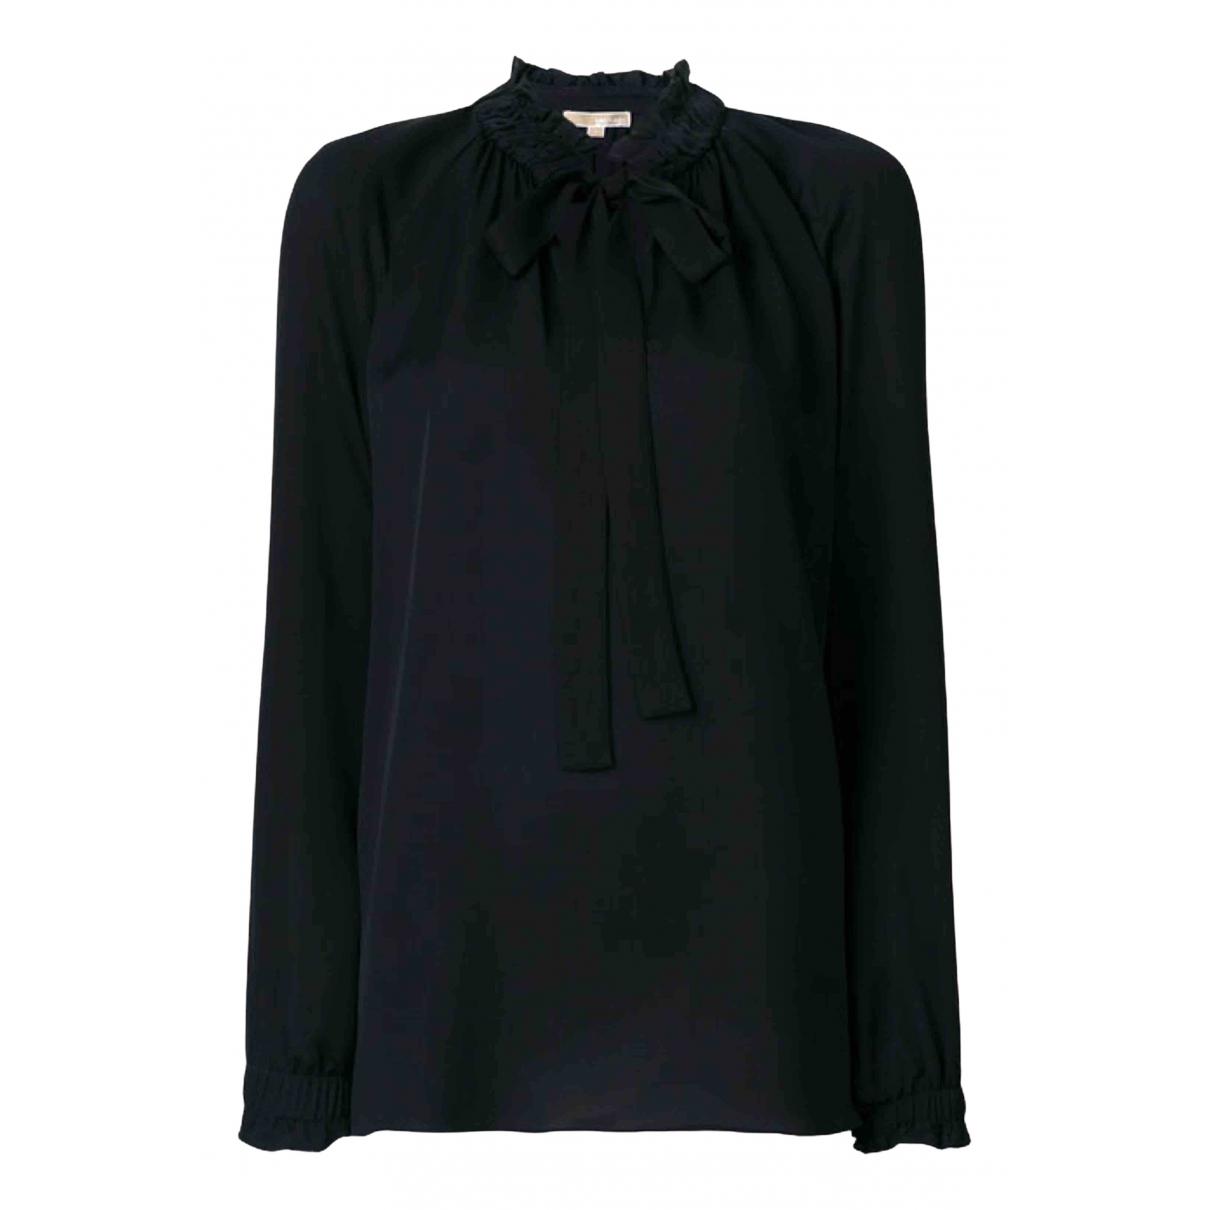 Michael Kors N Black Silk  top for Women M International